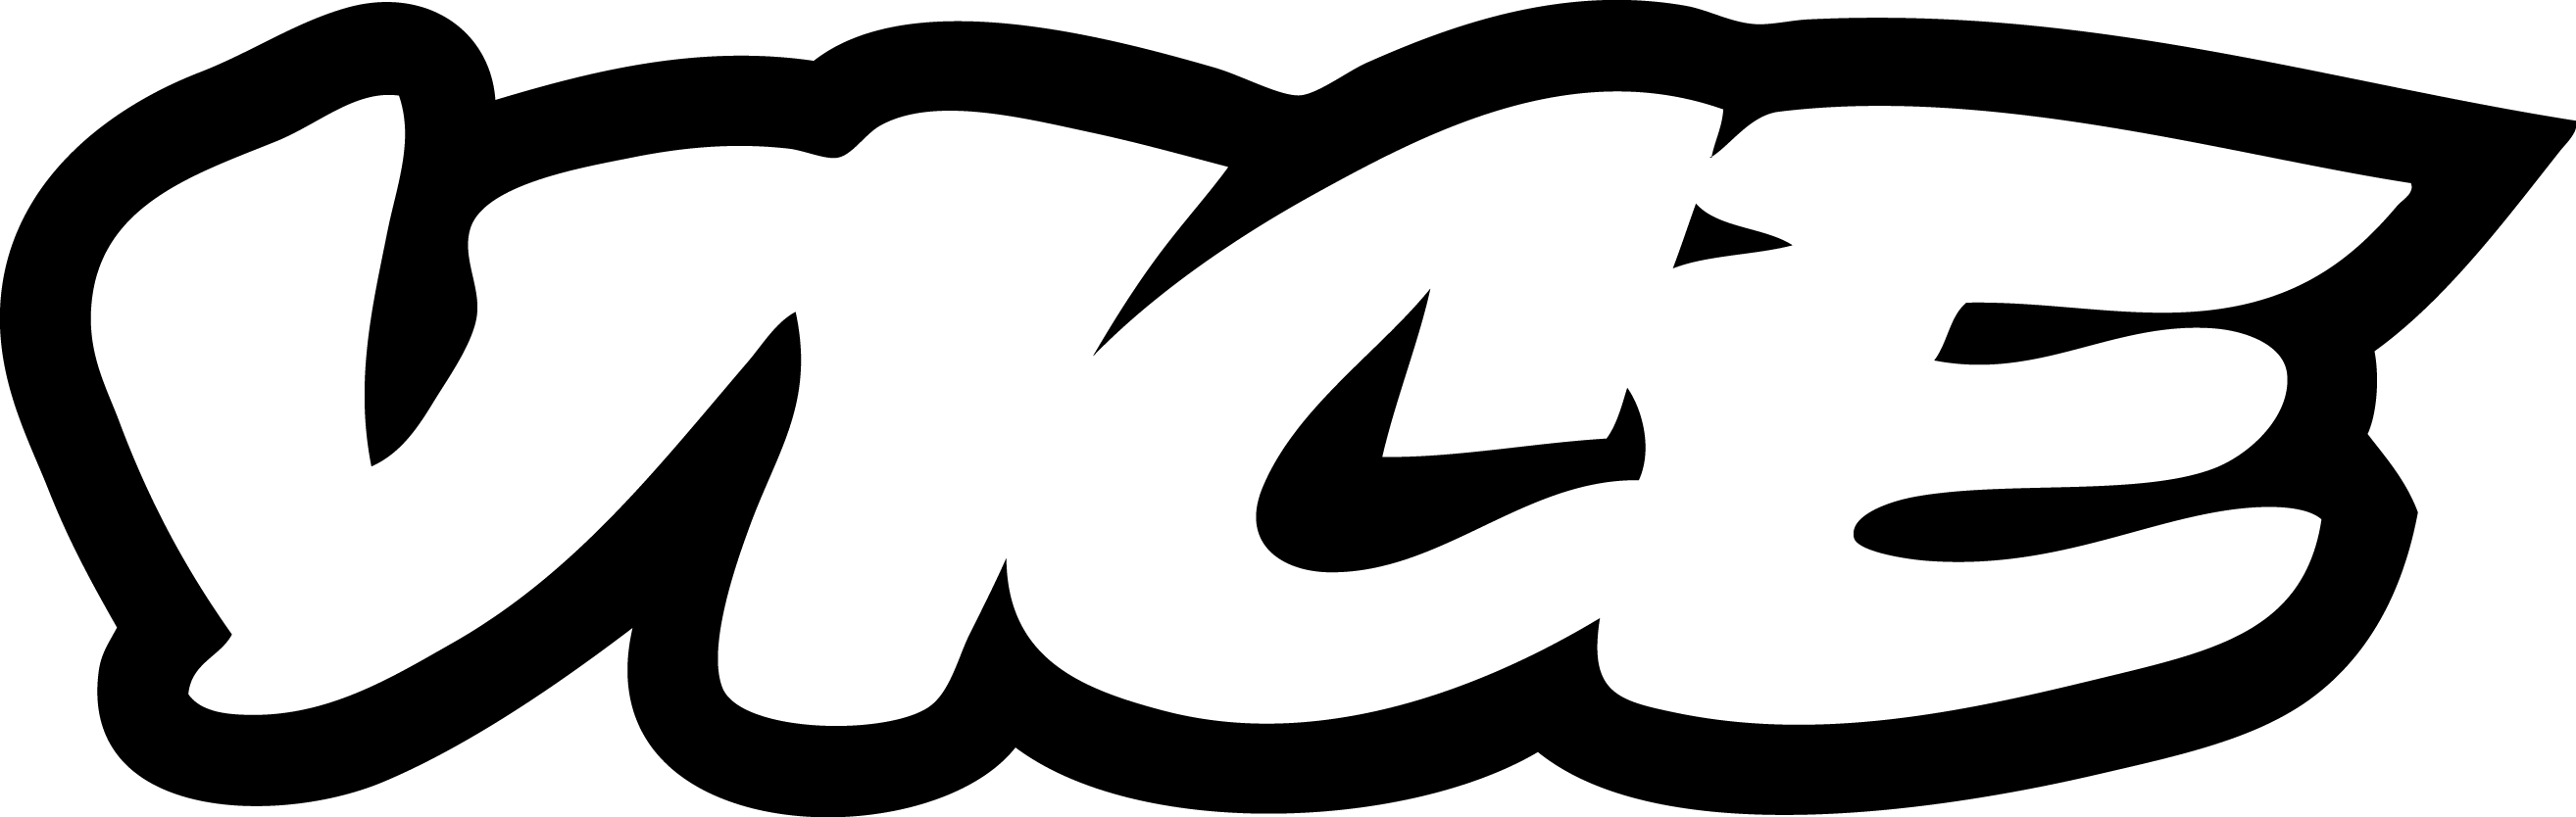 Vice Logo [magazine] png